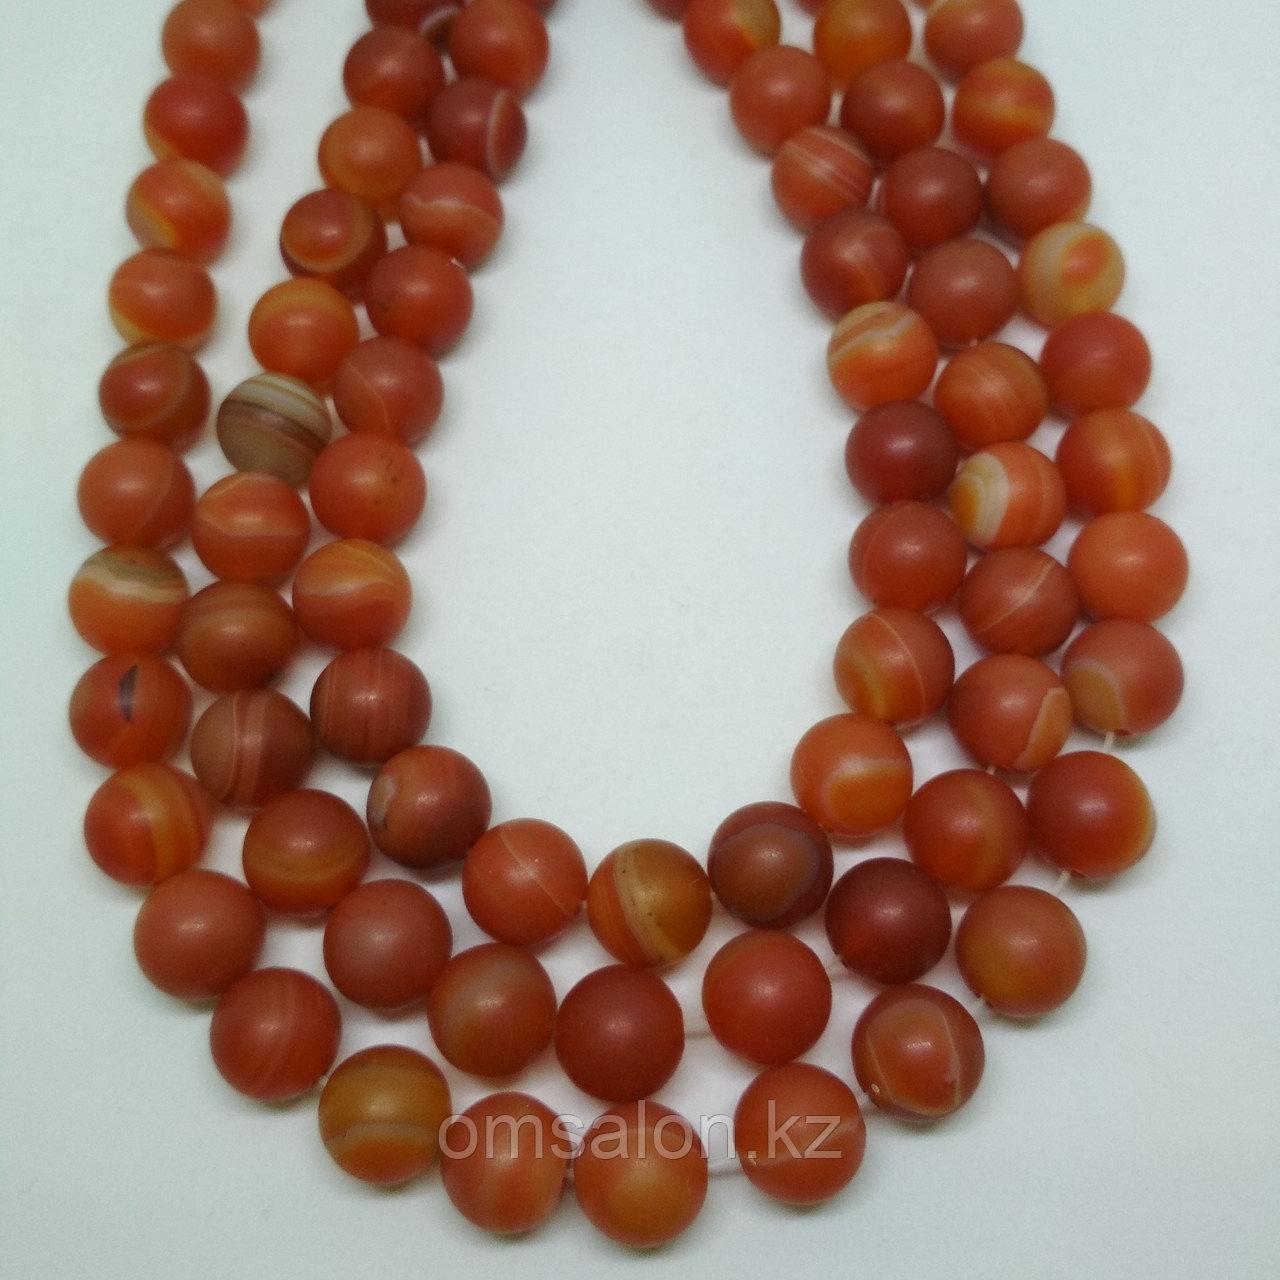 Агат оранжевый, матовый, 10 мм